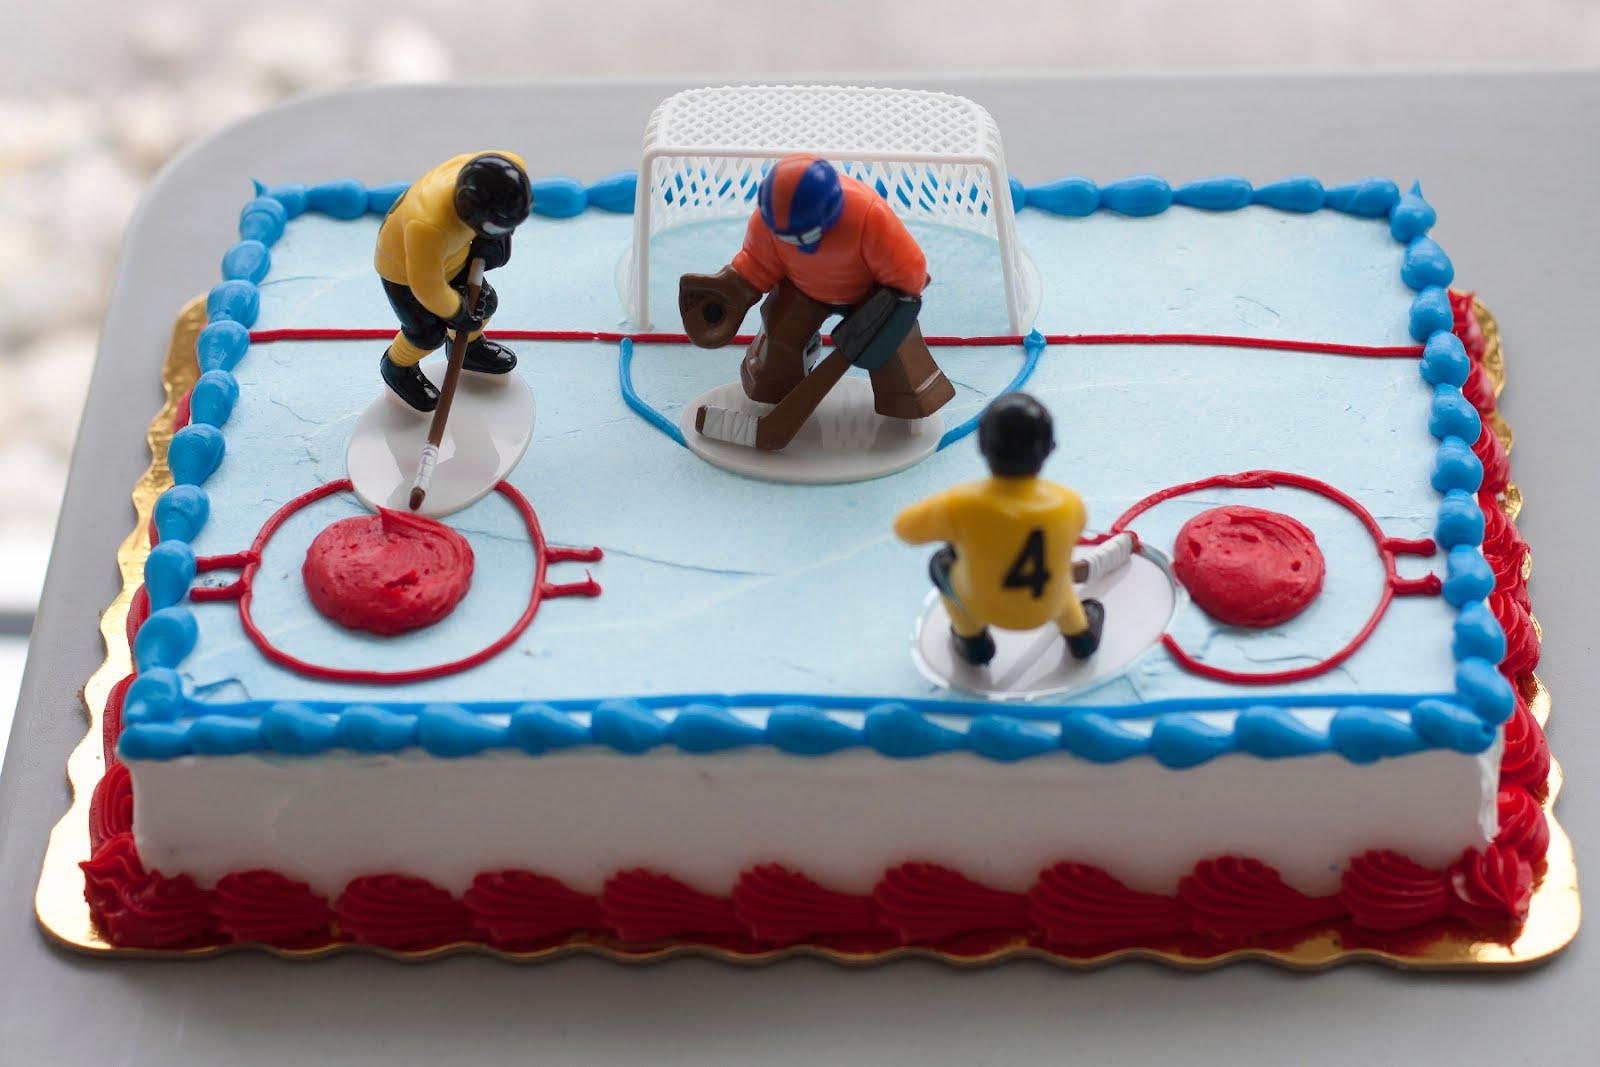 Ice Hockey Cake Pucks In The Glove Big Save Hockeygods